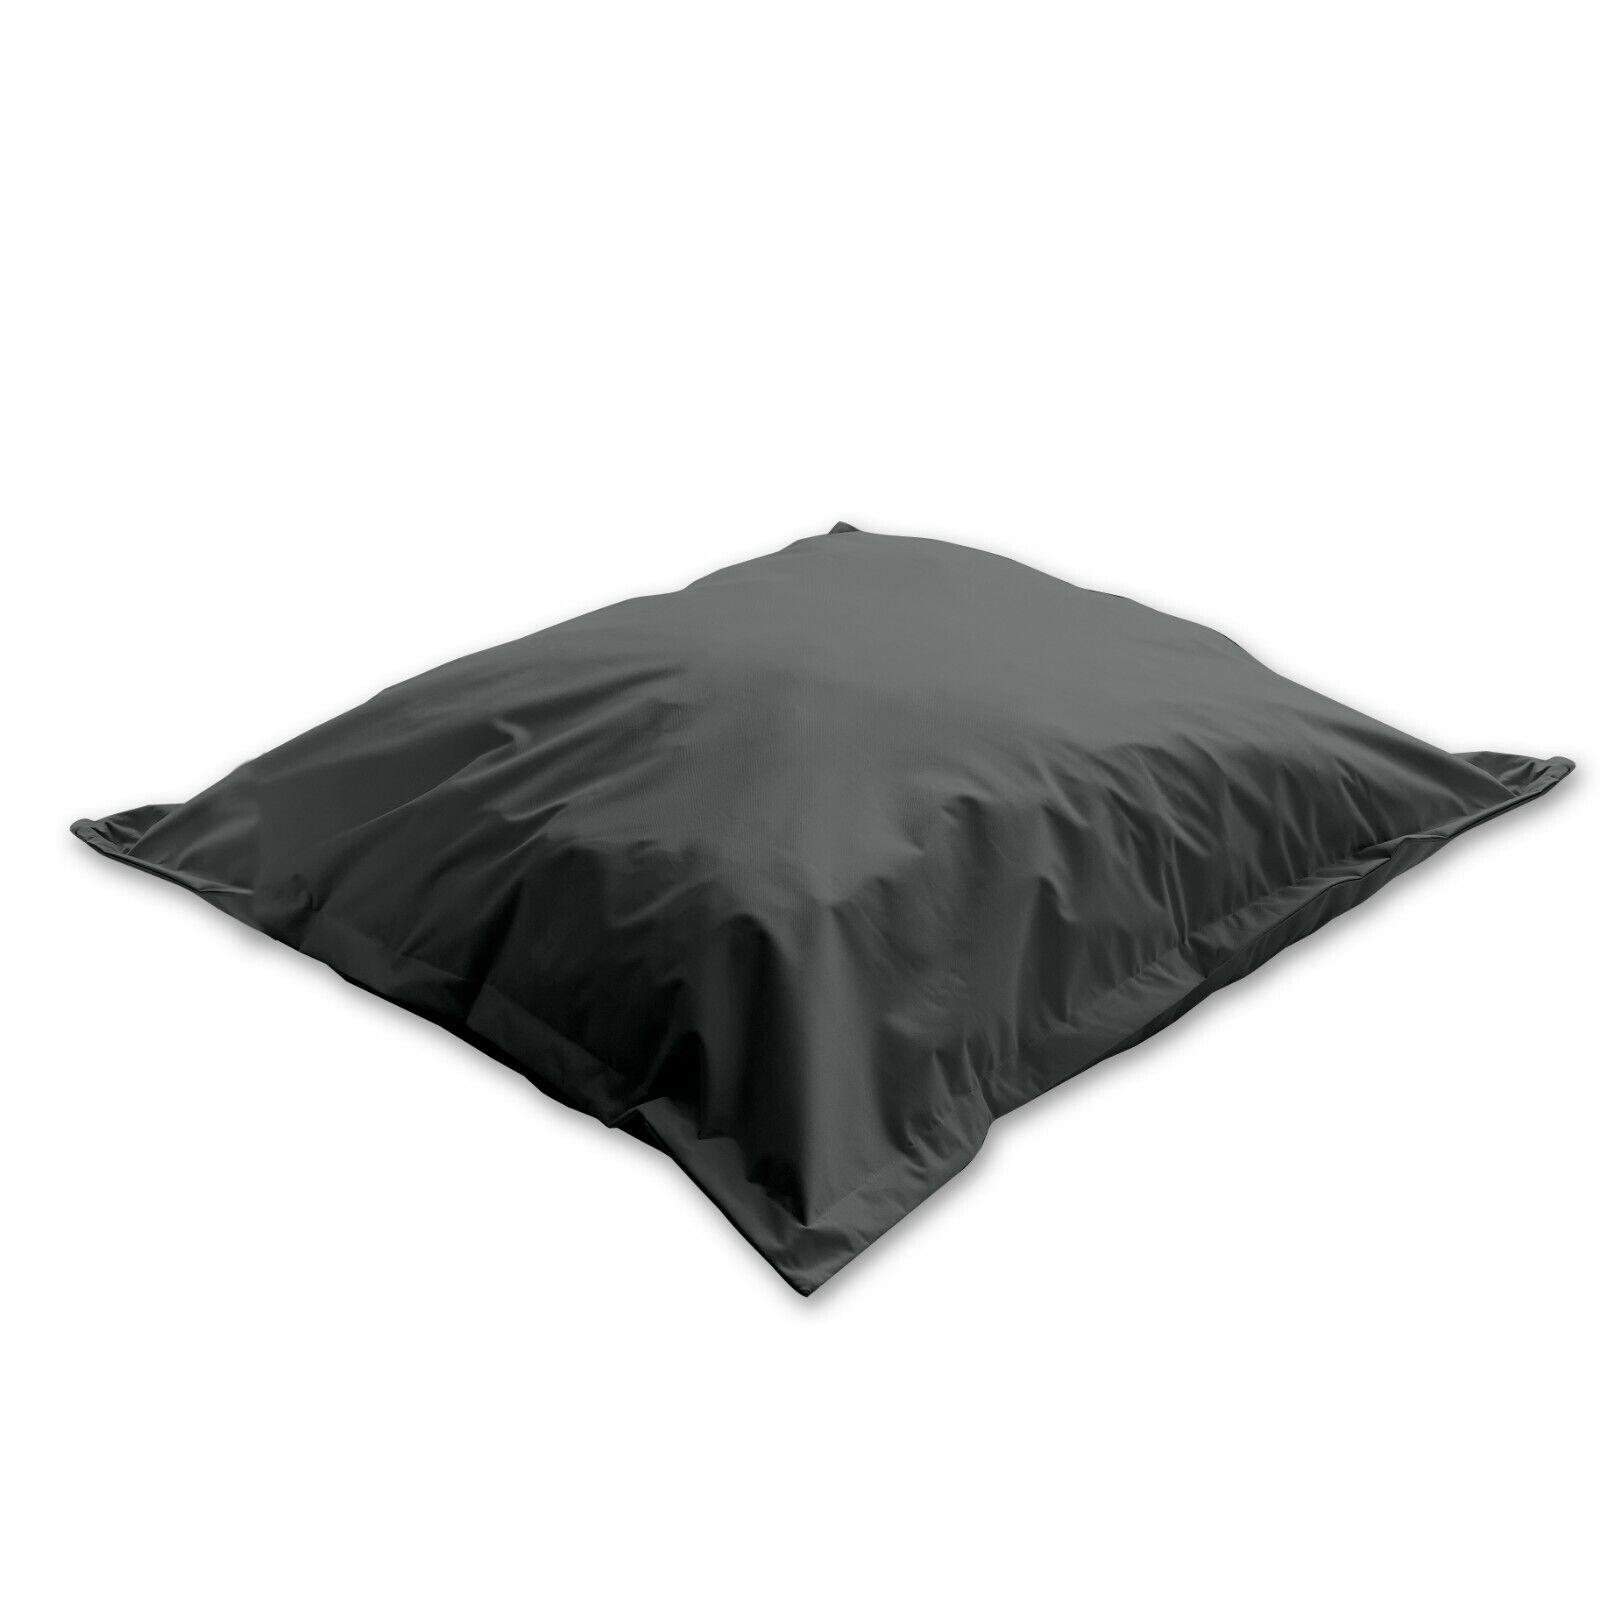 Spirit Garden outdoor almohada cojines de asiento XXL 110 x 110 cm impermeable Quartz